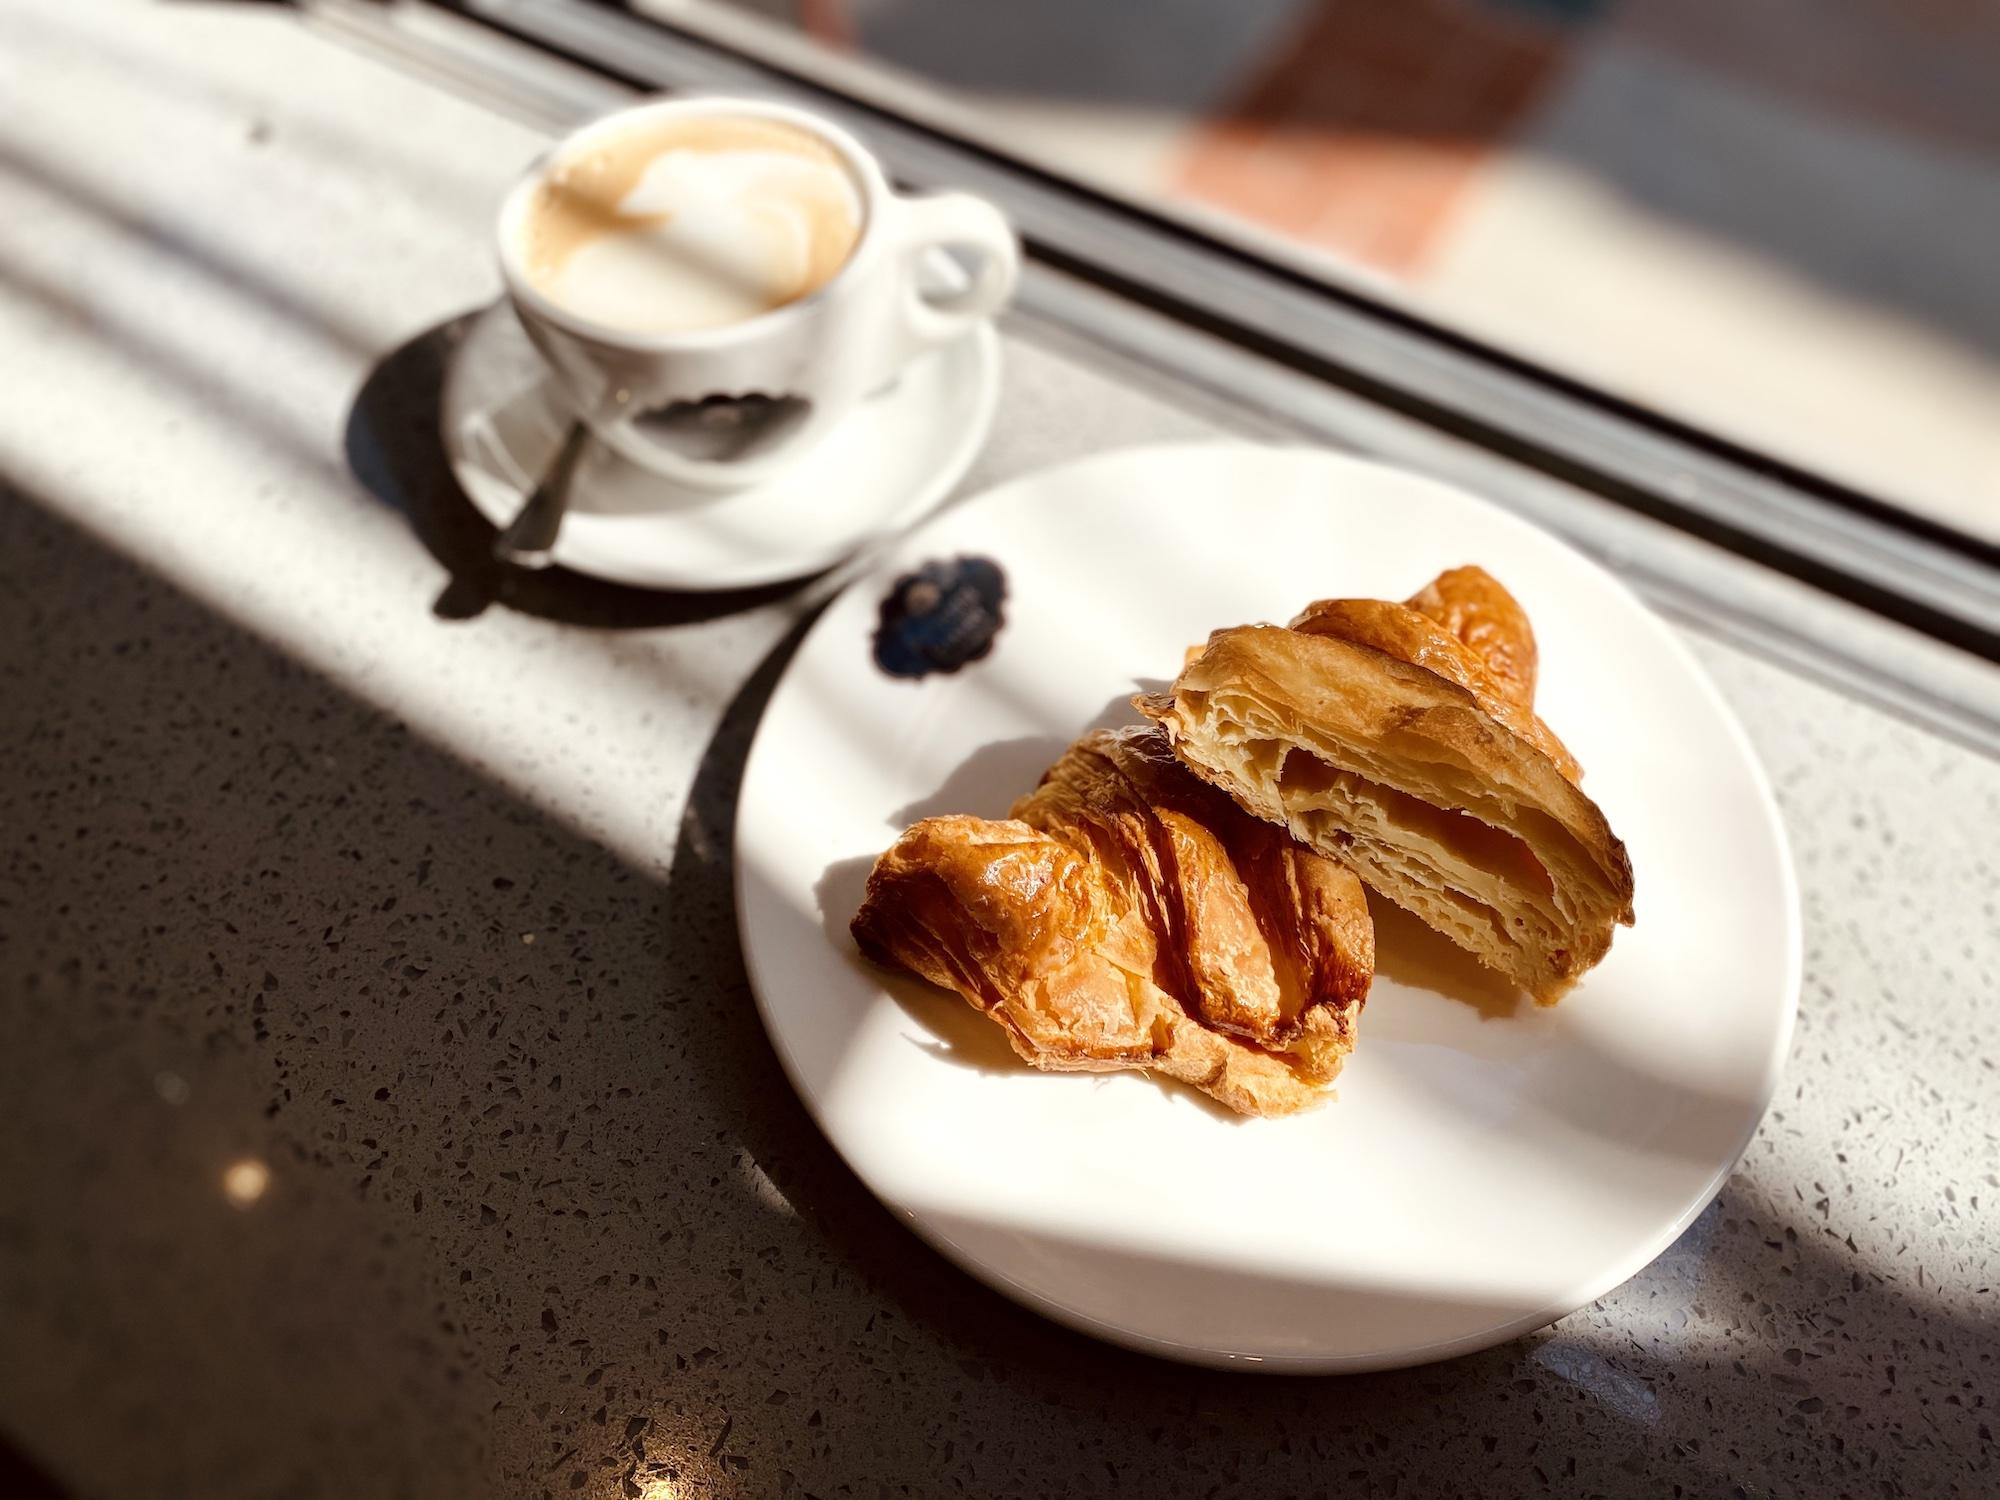 portuguese bakery taipa village croissant